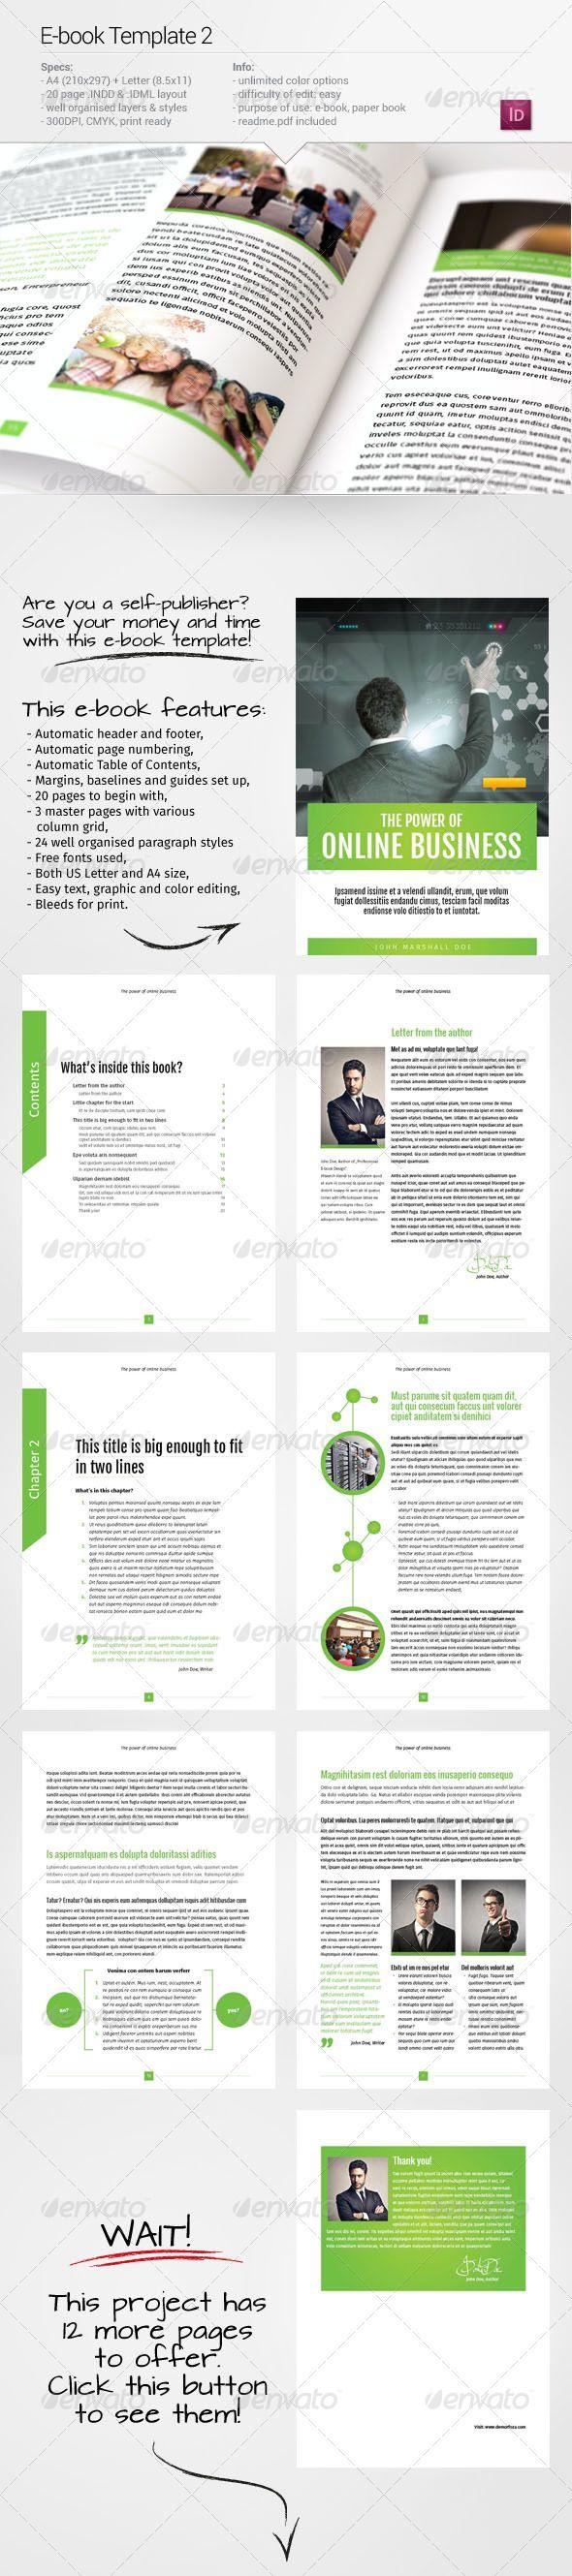 The 96 best E-Publishing Templates images on Pinterest | Font logo ...